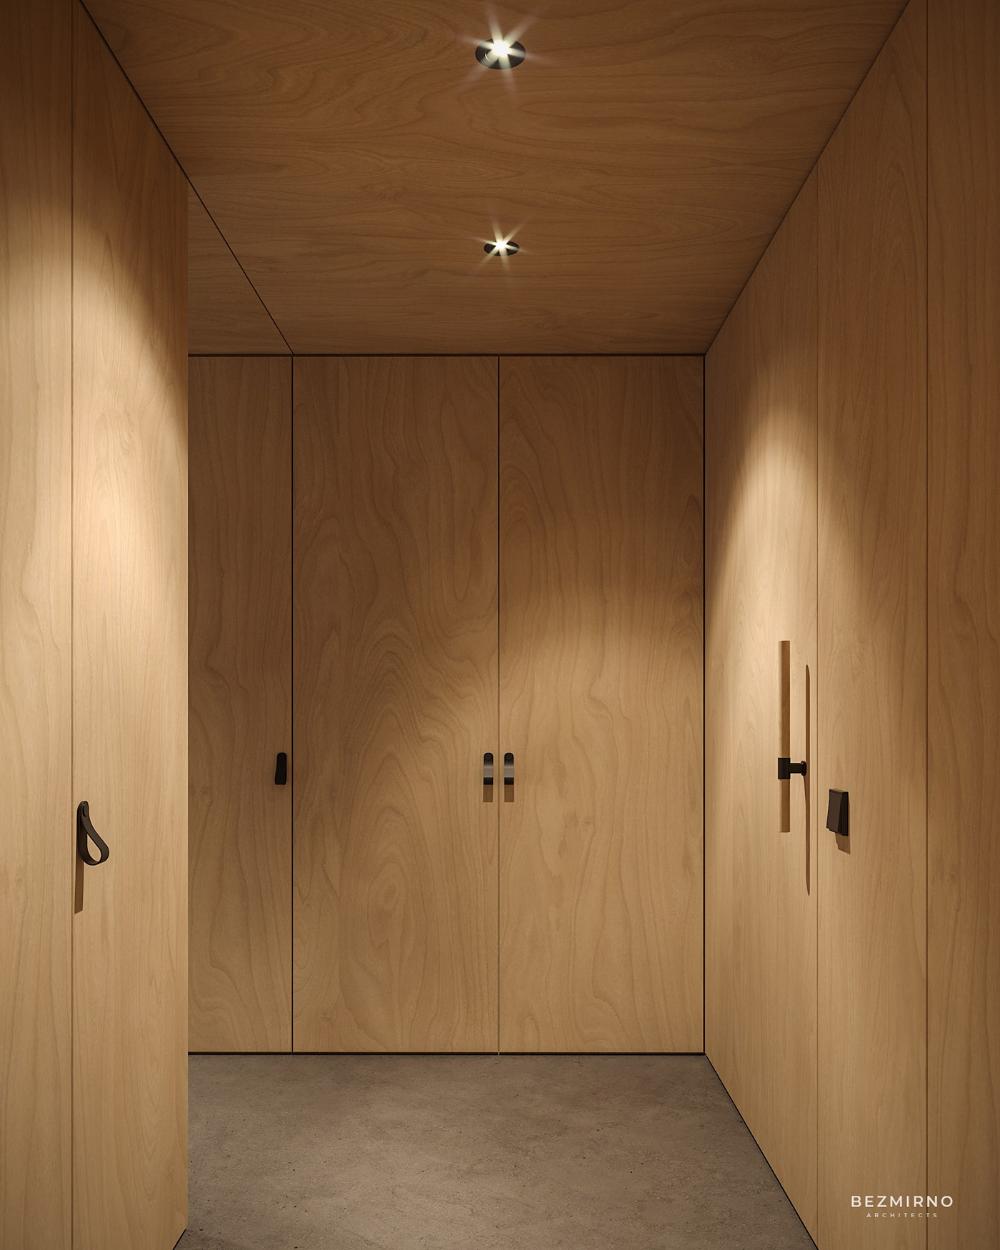 Autodesk Room Design: Behance :: For You (Có Hình ảnh